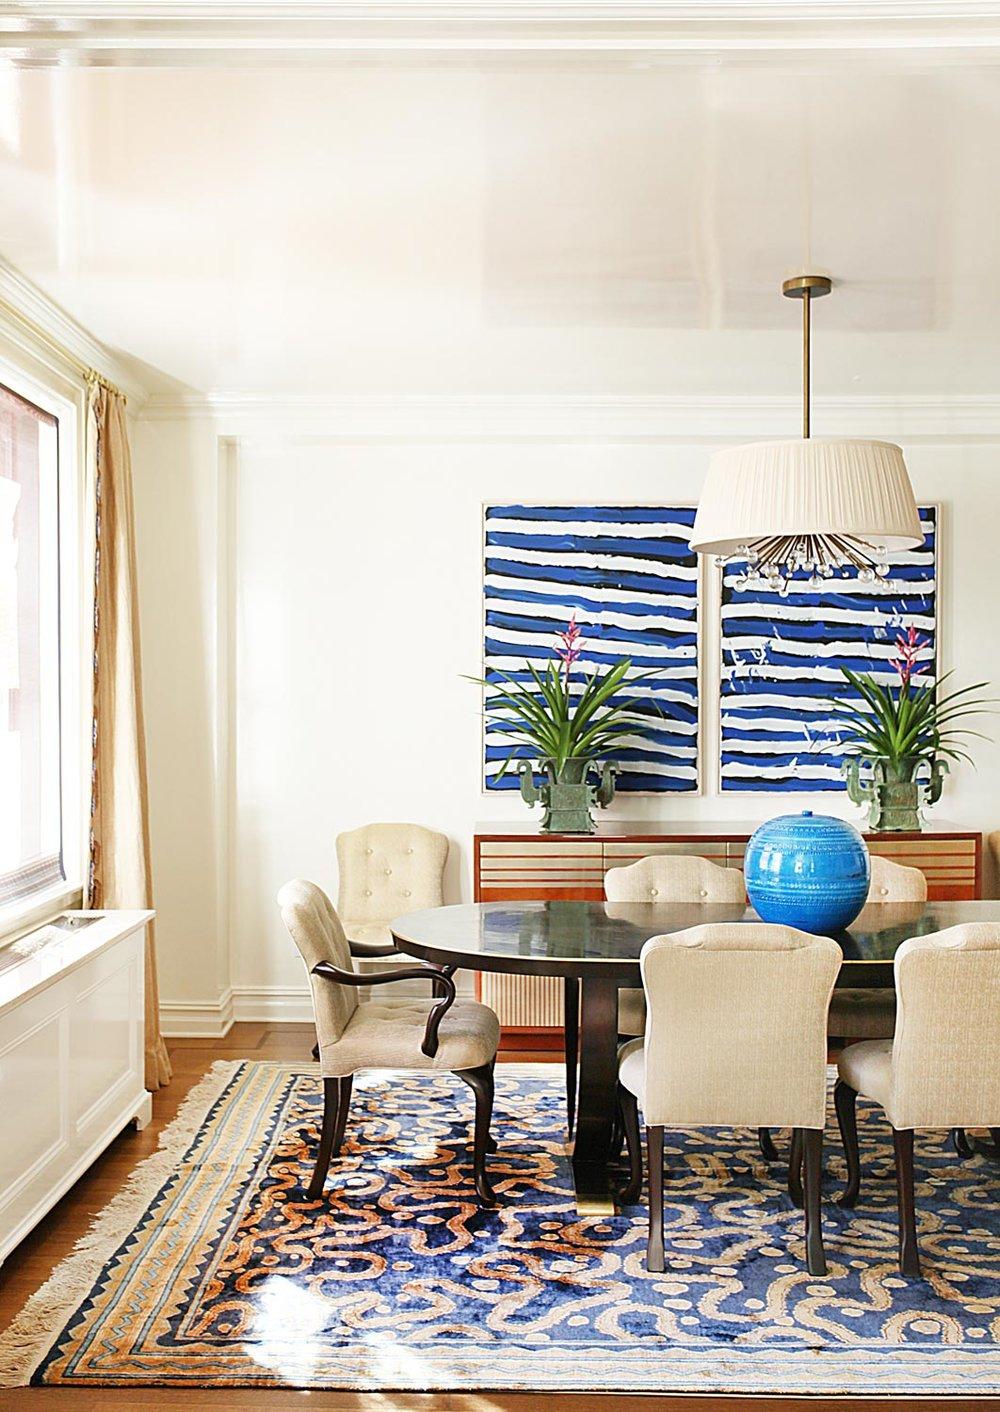 Darren-Henault-New-York-Interior-Luxury-5.jpg